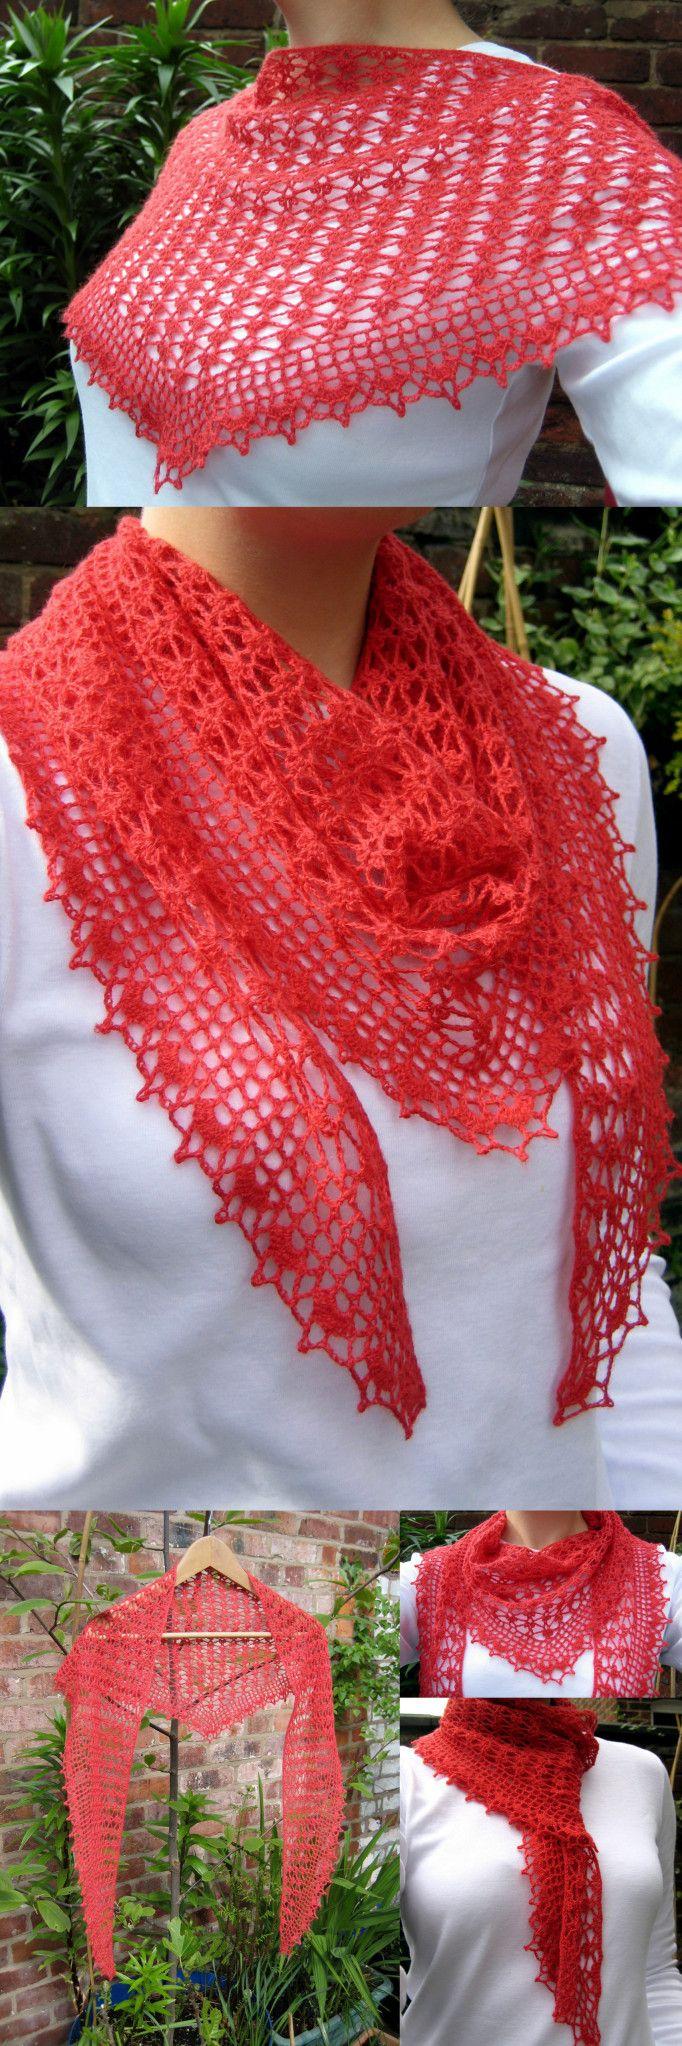 Summer Sprigs Lace Scarf - Free pattern! | Crochet or Knit It ...